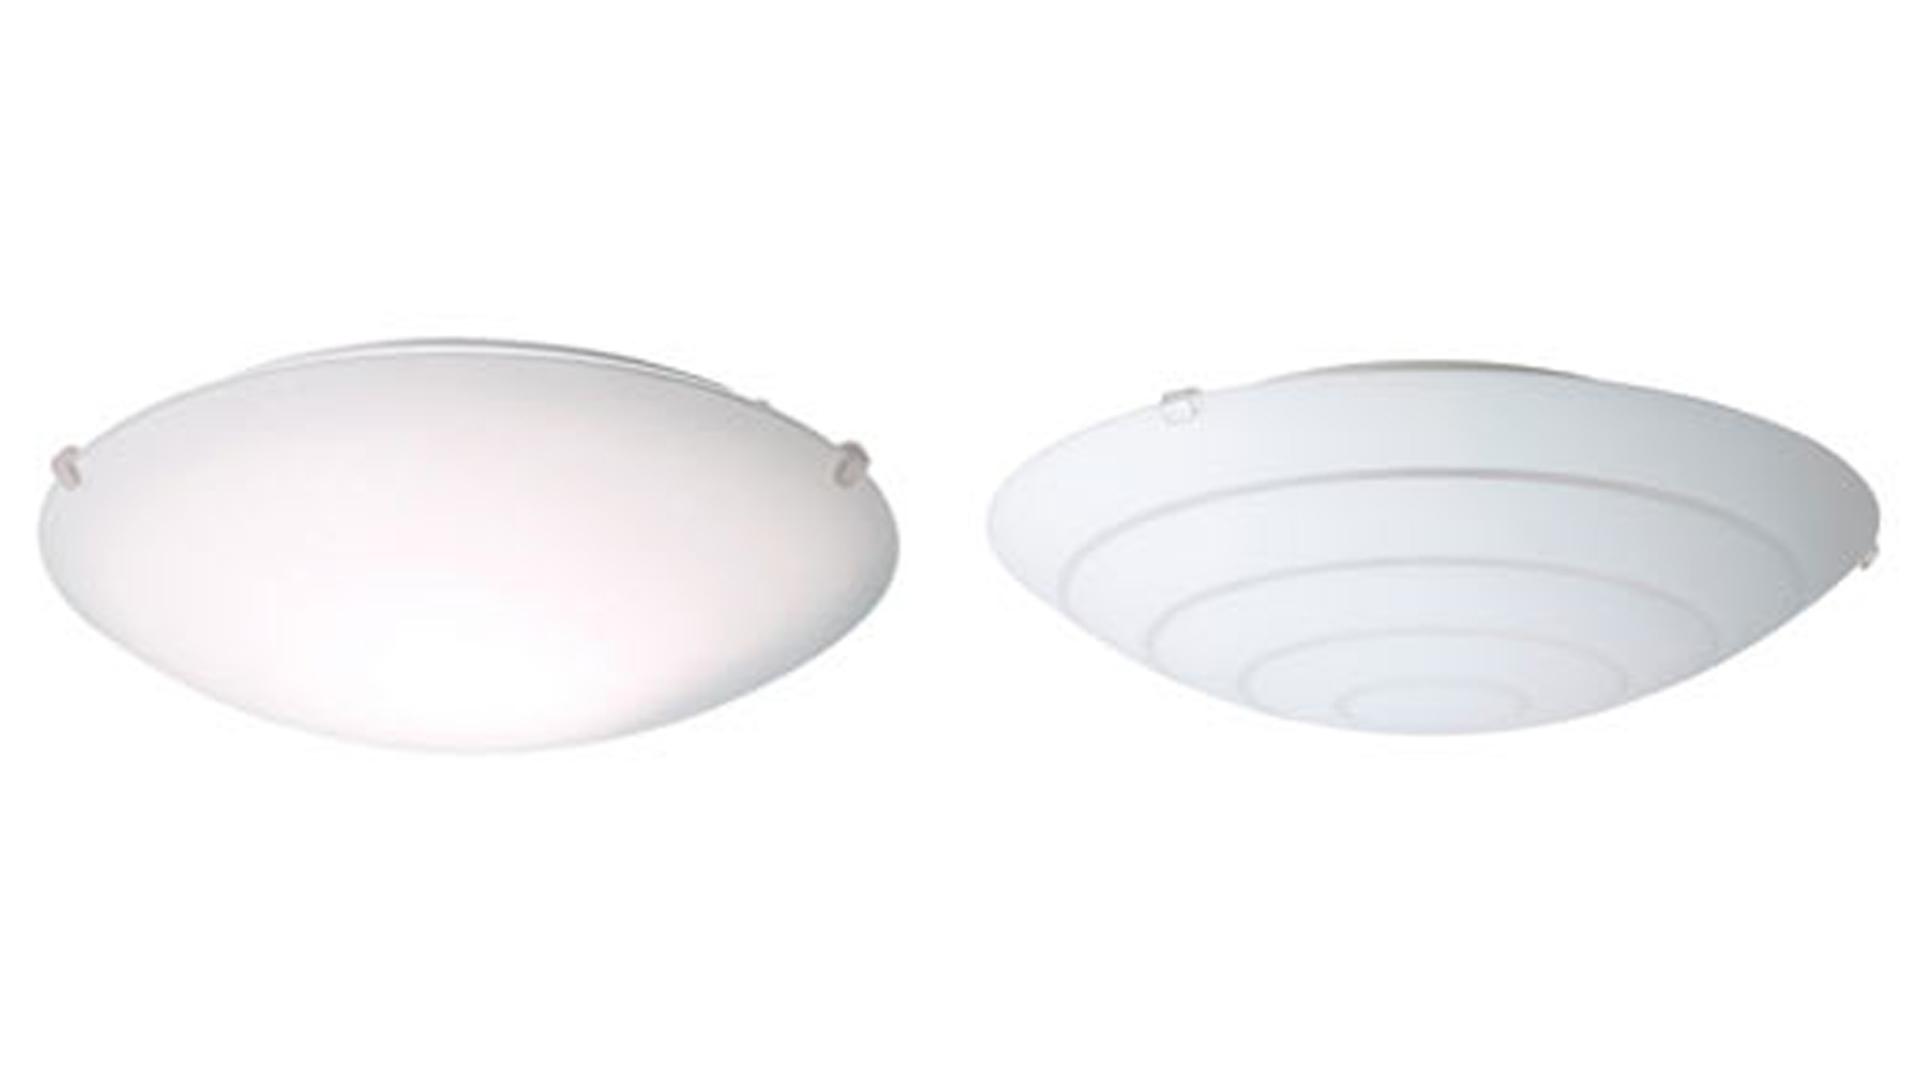 Ikea Ceiling Lamp Recall Chch